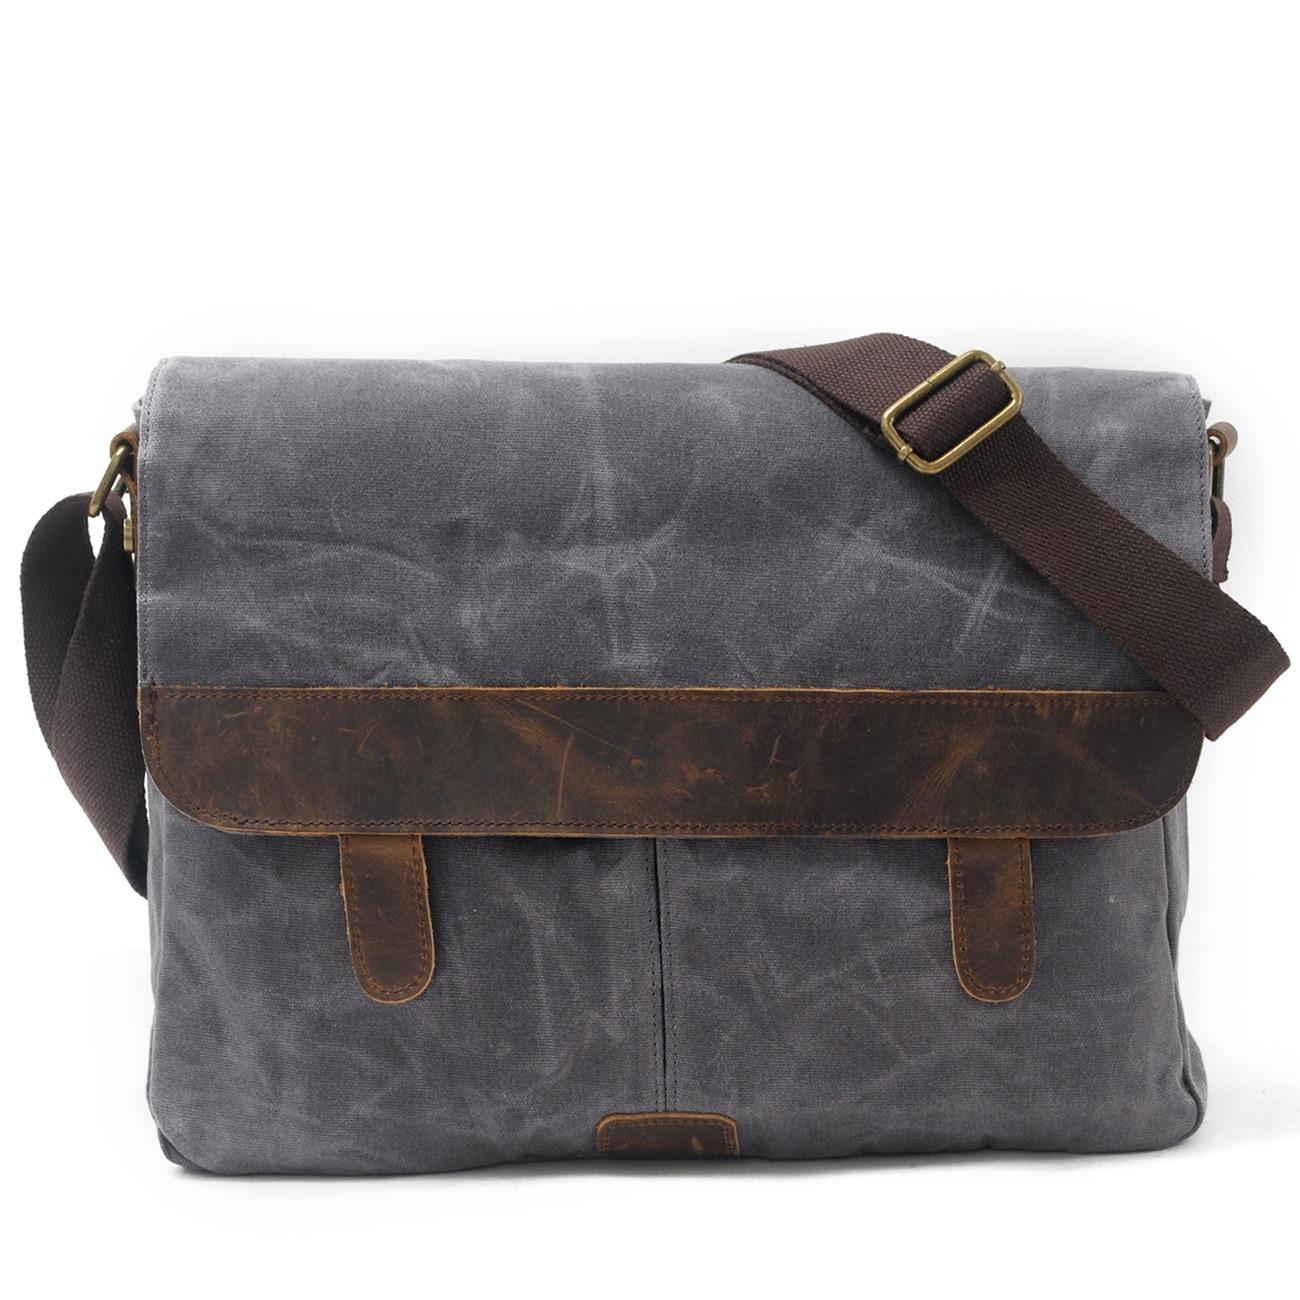 Men's leisure bag bag wax canvas with Crazy Horse Luxury Cowboy Oil Skin Leather Bags  Satchel Bag retro and waterproof ибп eaton 5130 1250va rt 2u